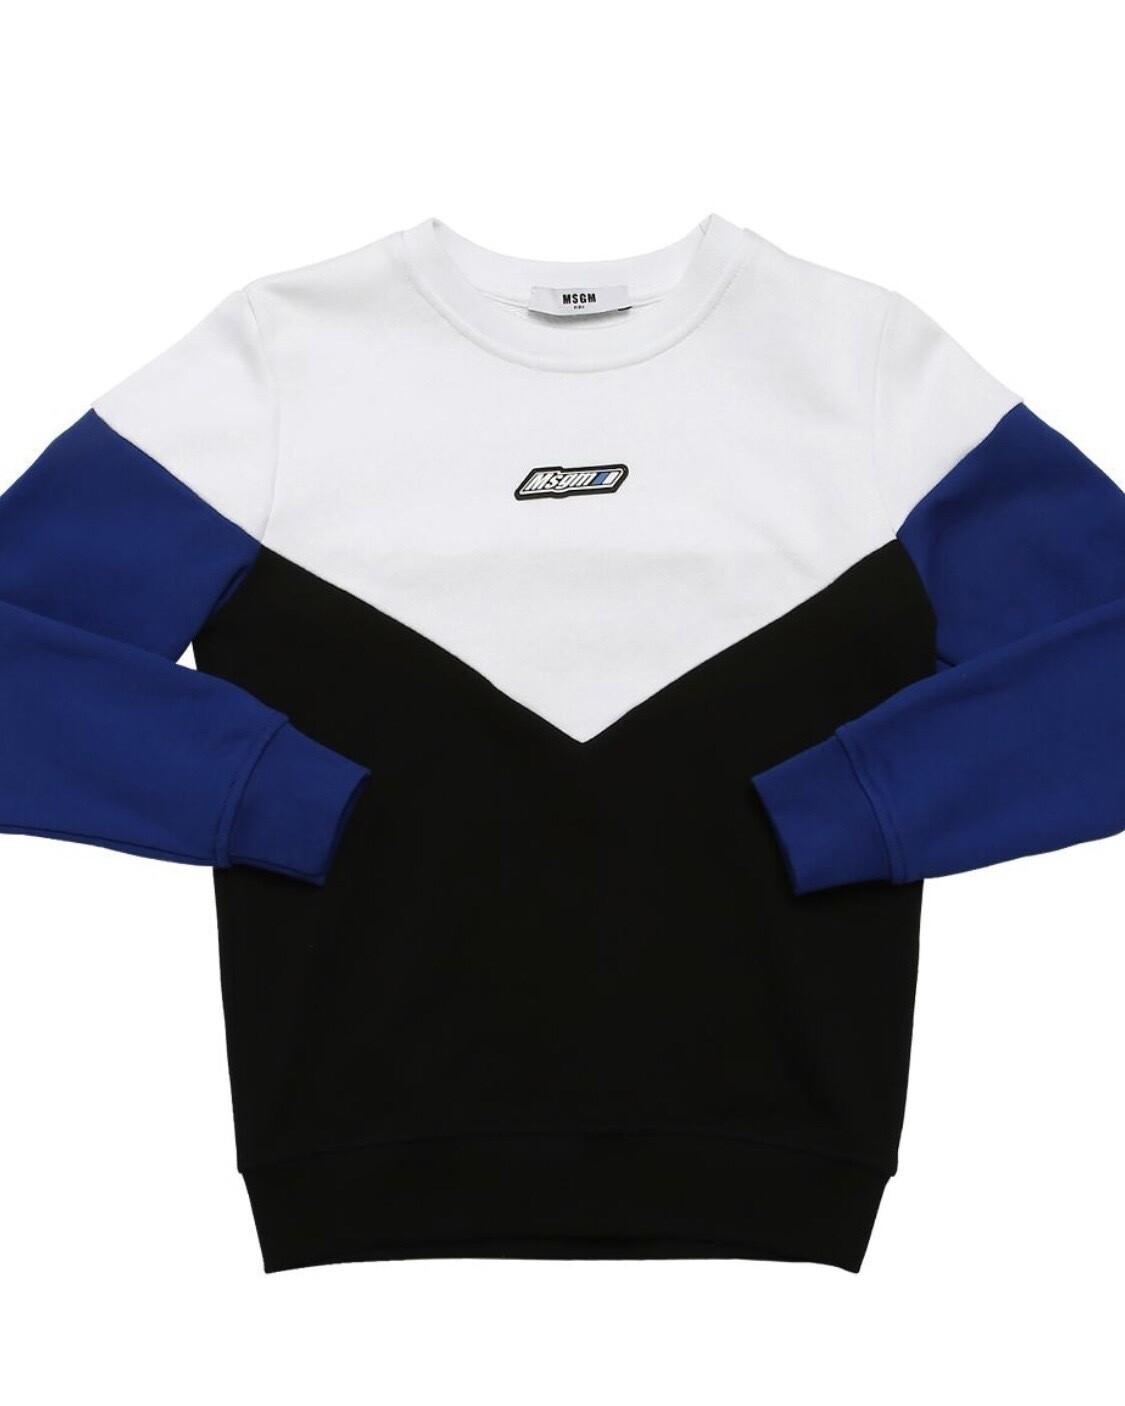 MSGM Color Block Sweatshirt